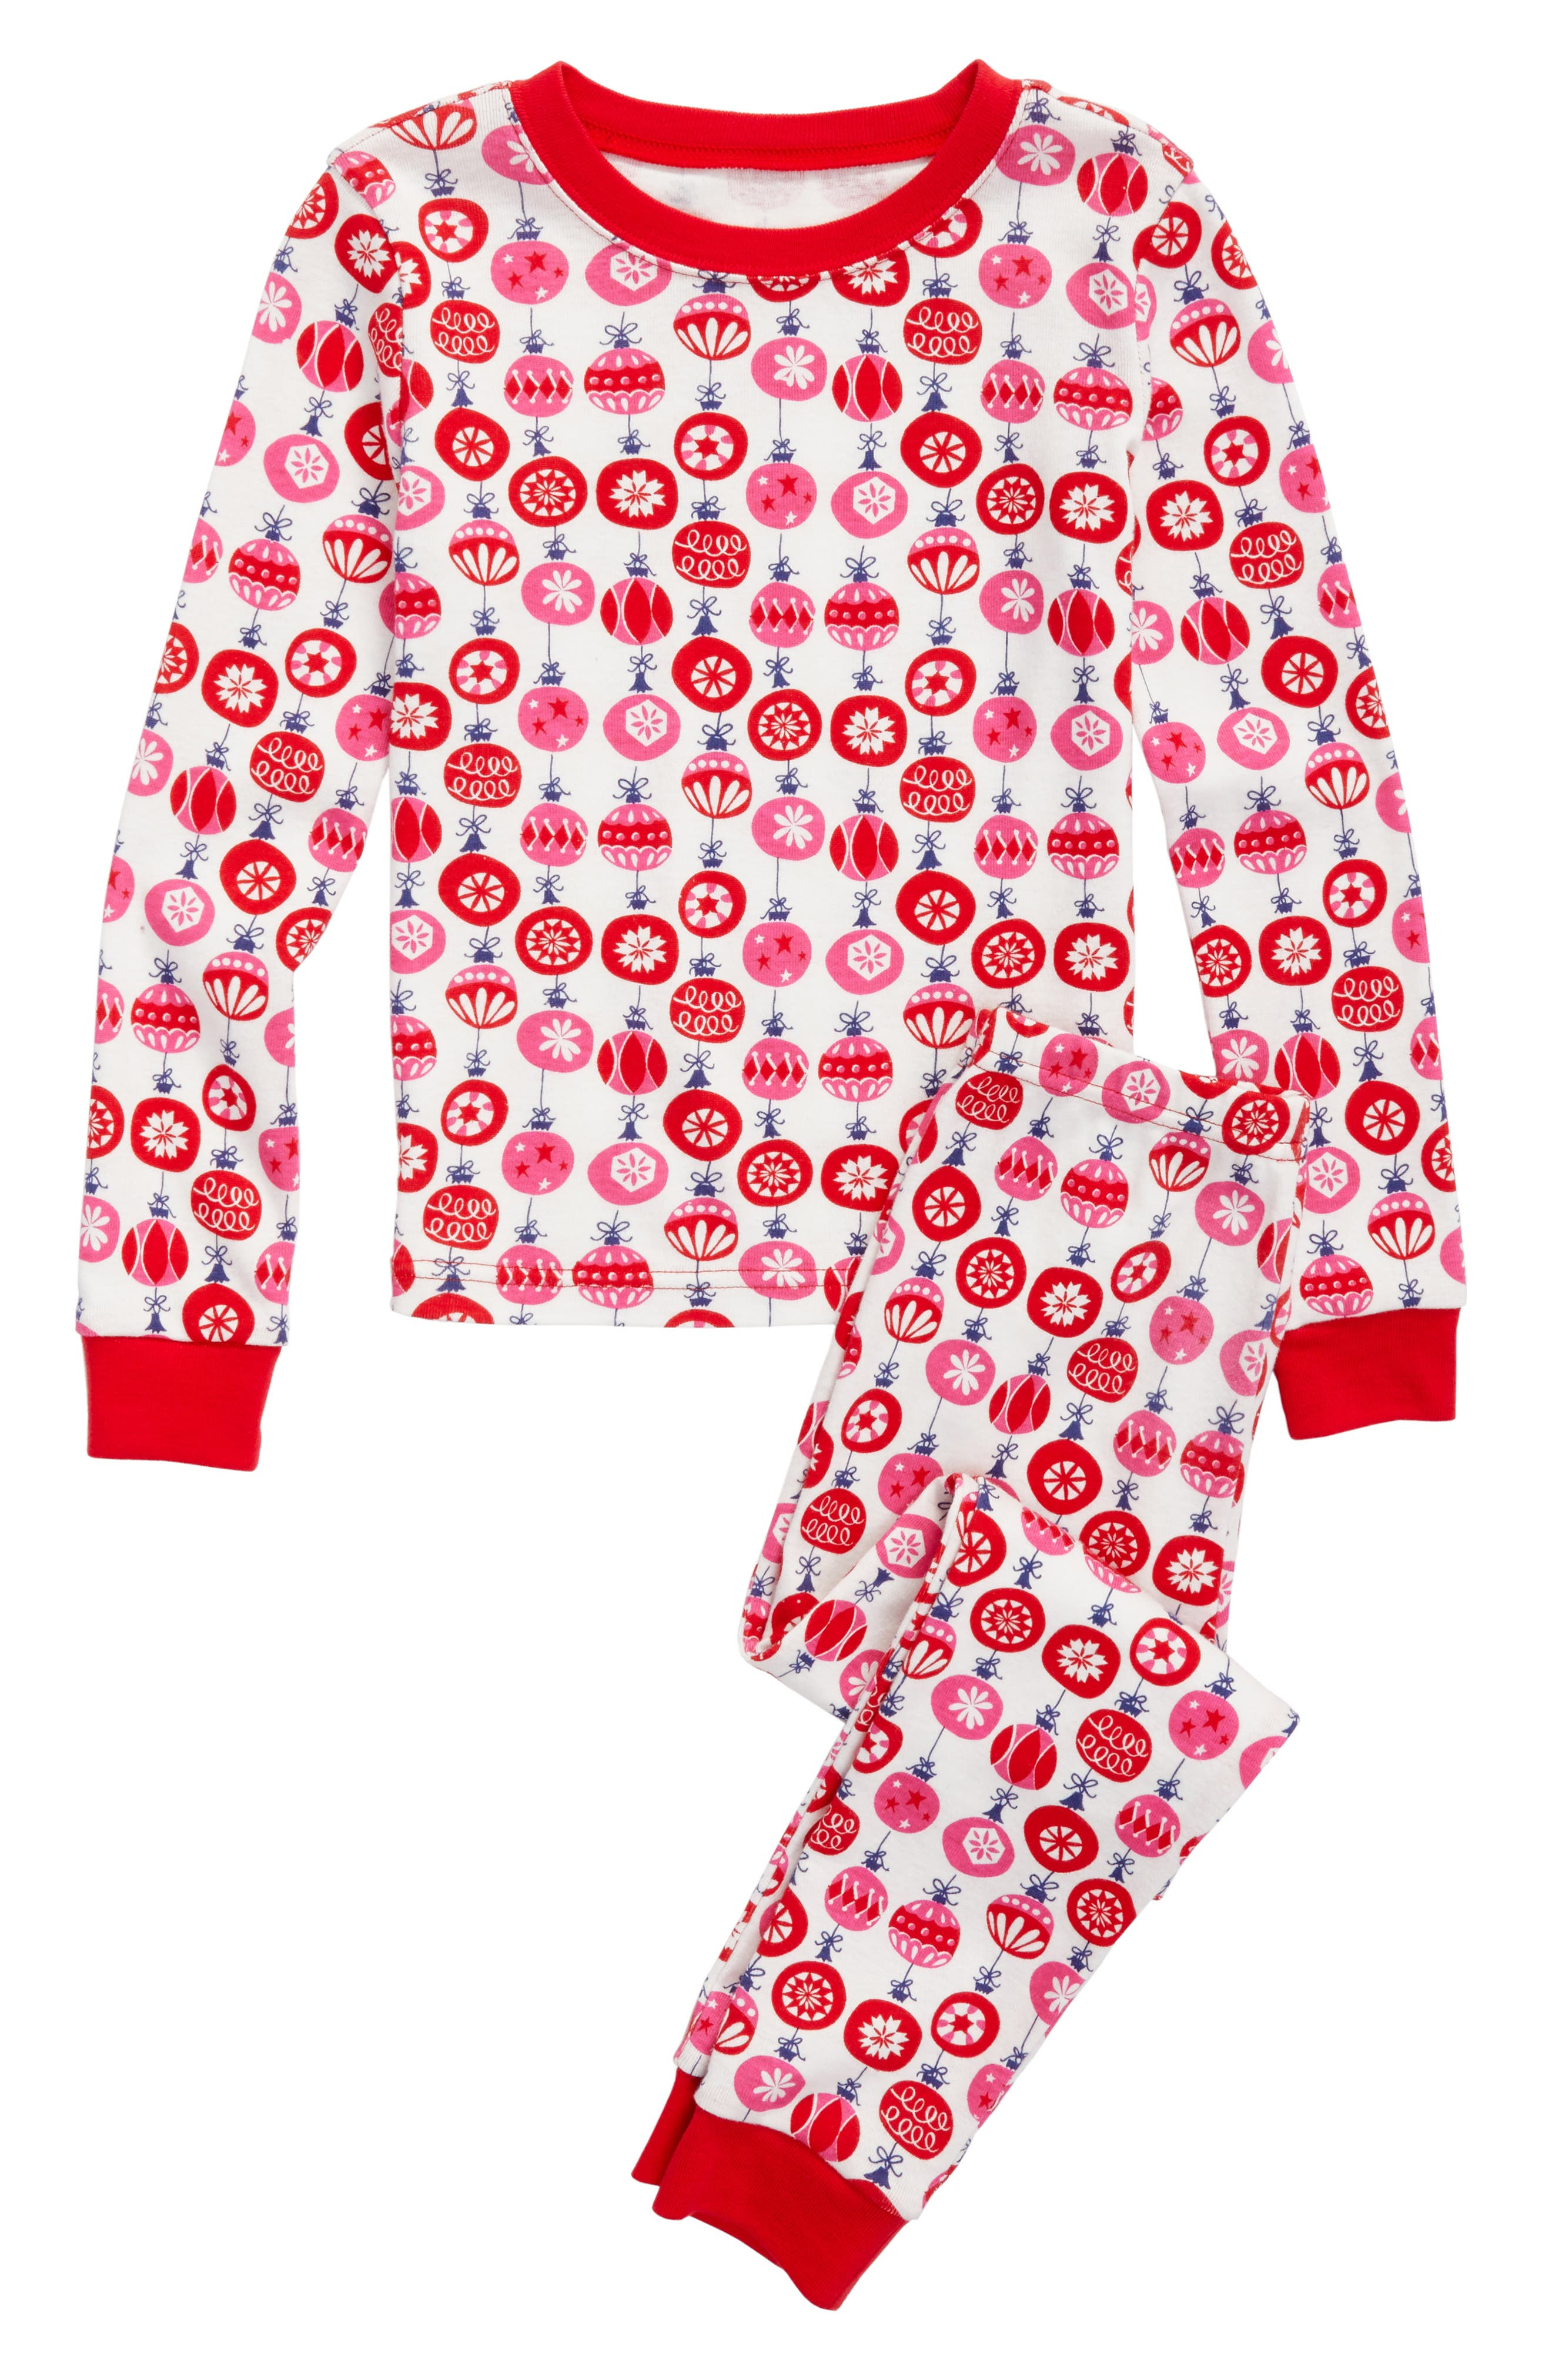 Alternate Image 1 Selected - Tucker + Tate Fitted Two-Piece Pajamas (Toddler Girls, Little Girls & Big Girls)